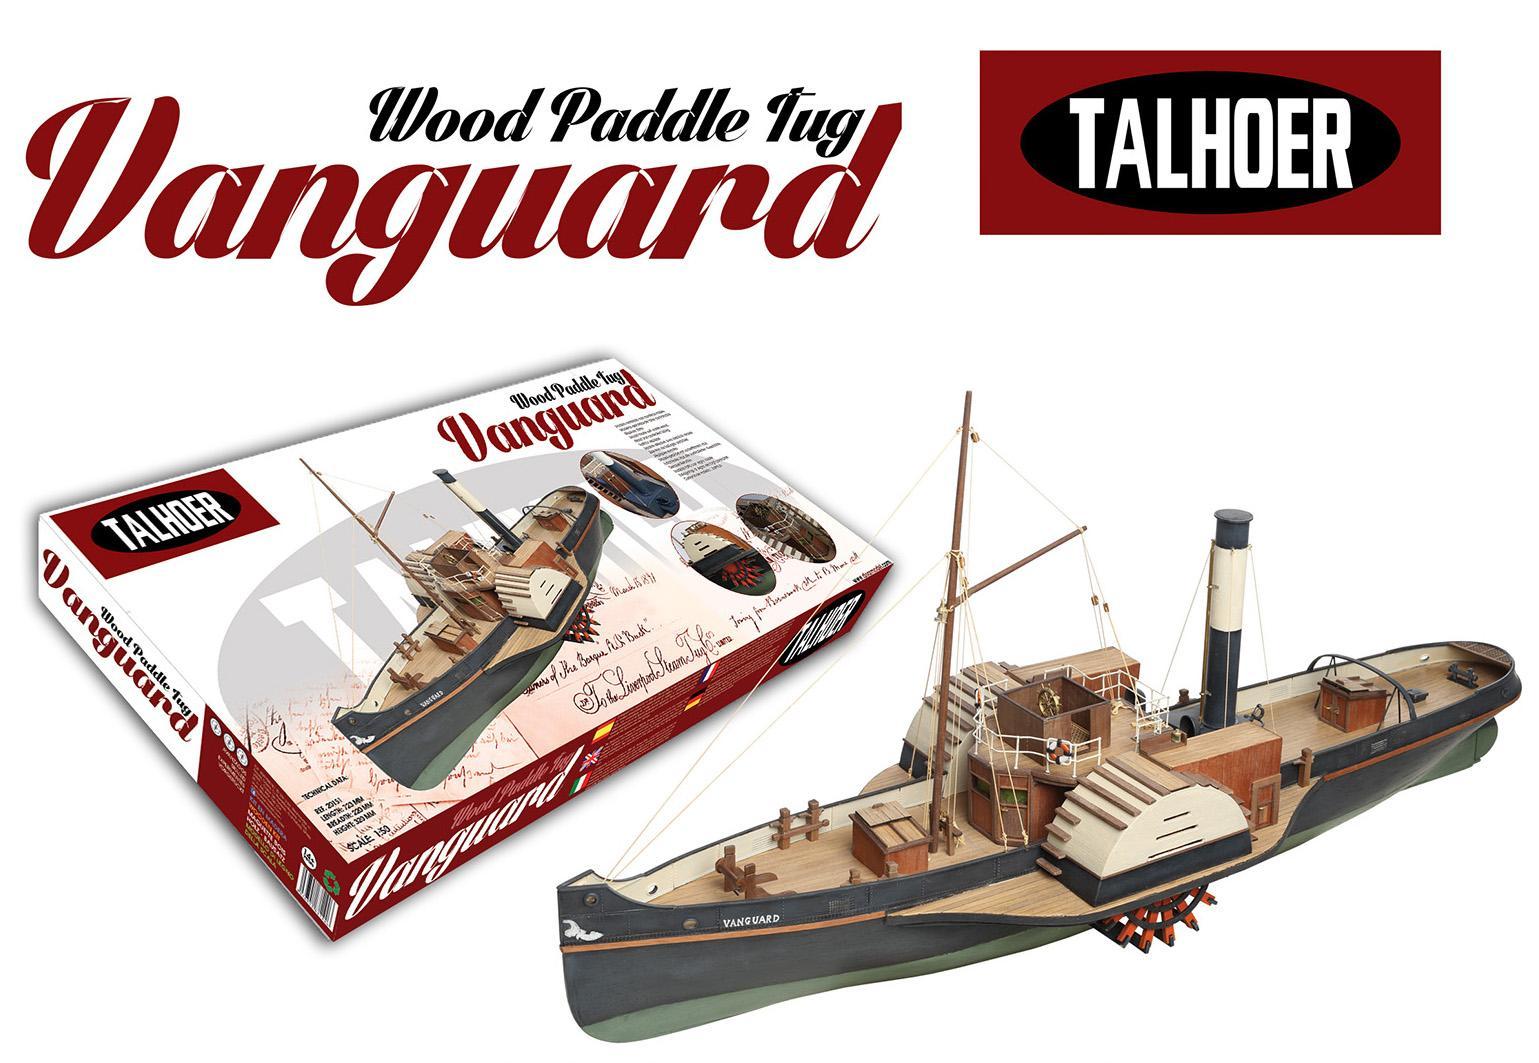 Boat Kits Product : Wooden paddle tug vanguard model ship kit by disar